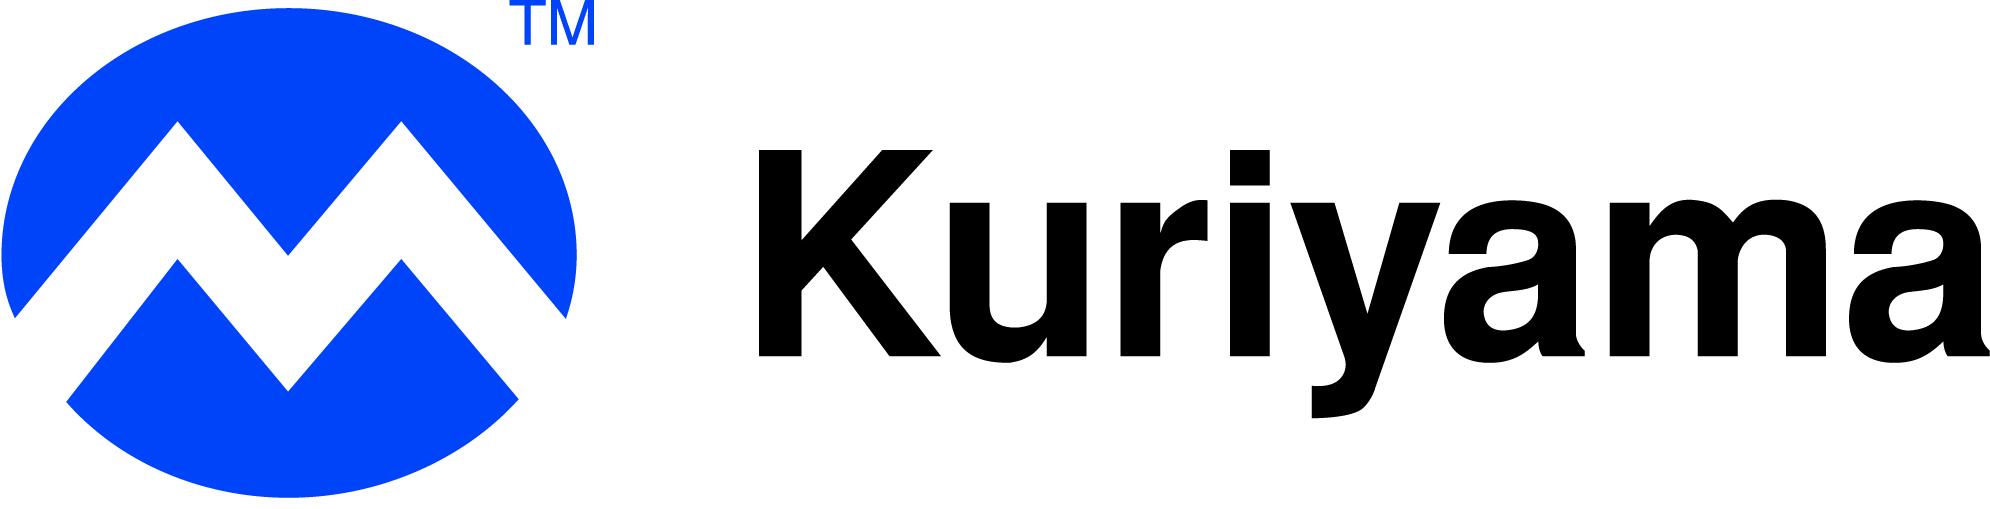 kuroyama.jpg